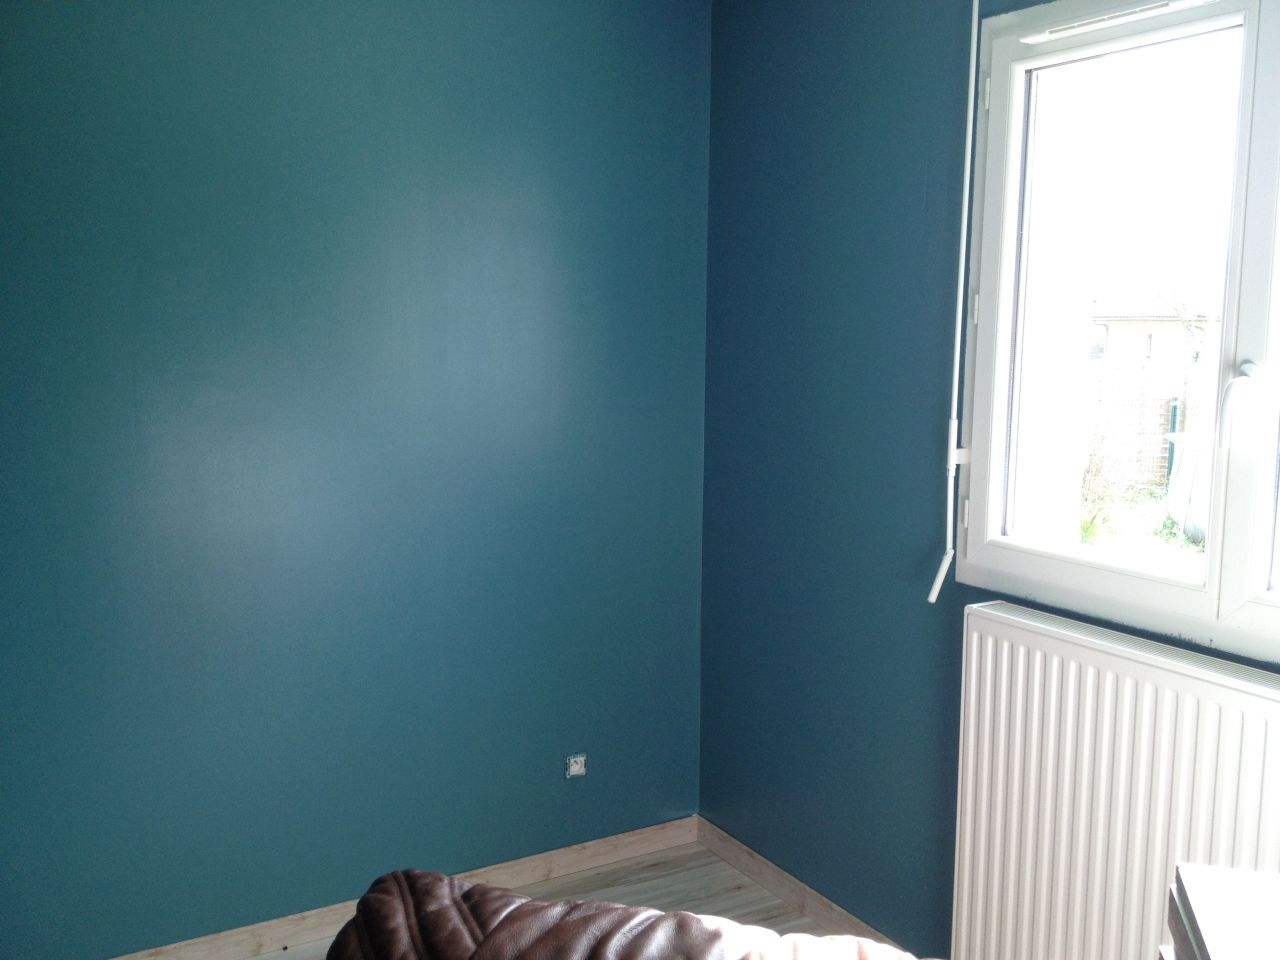 Photo chambre d 39 adultes ambiance petit gar on tarnes - Ambiance chambre garcon ...